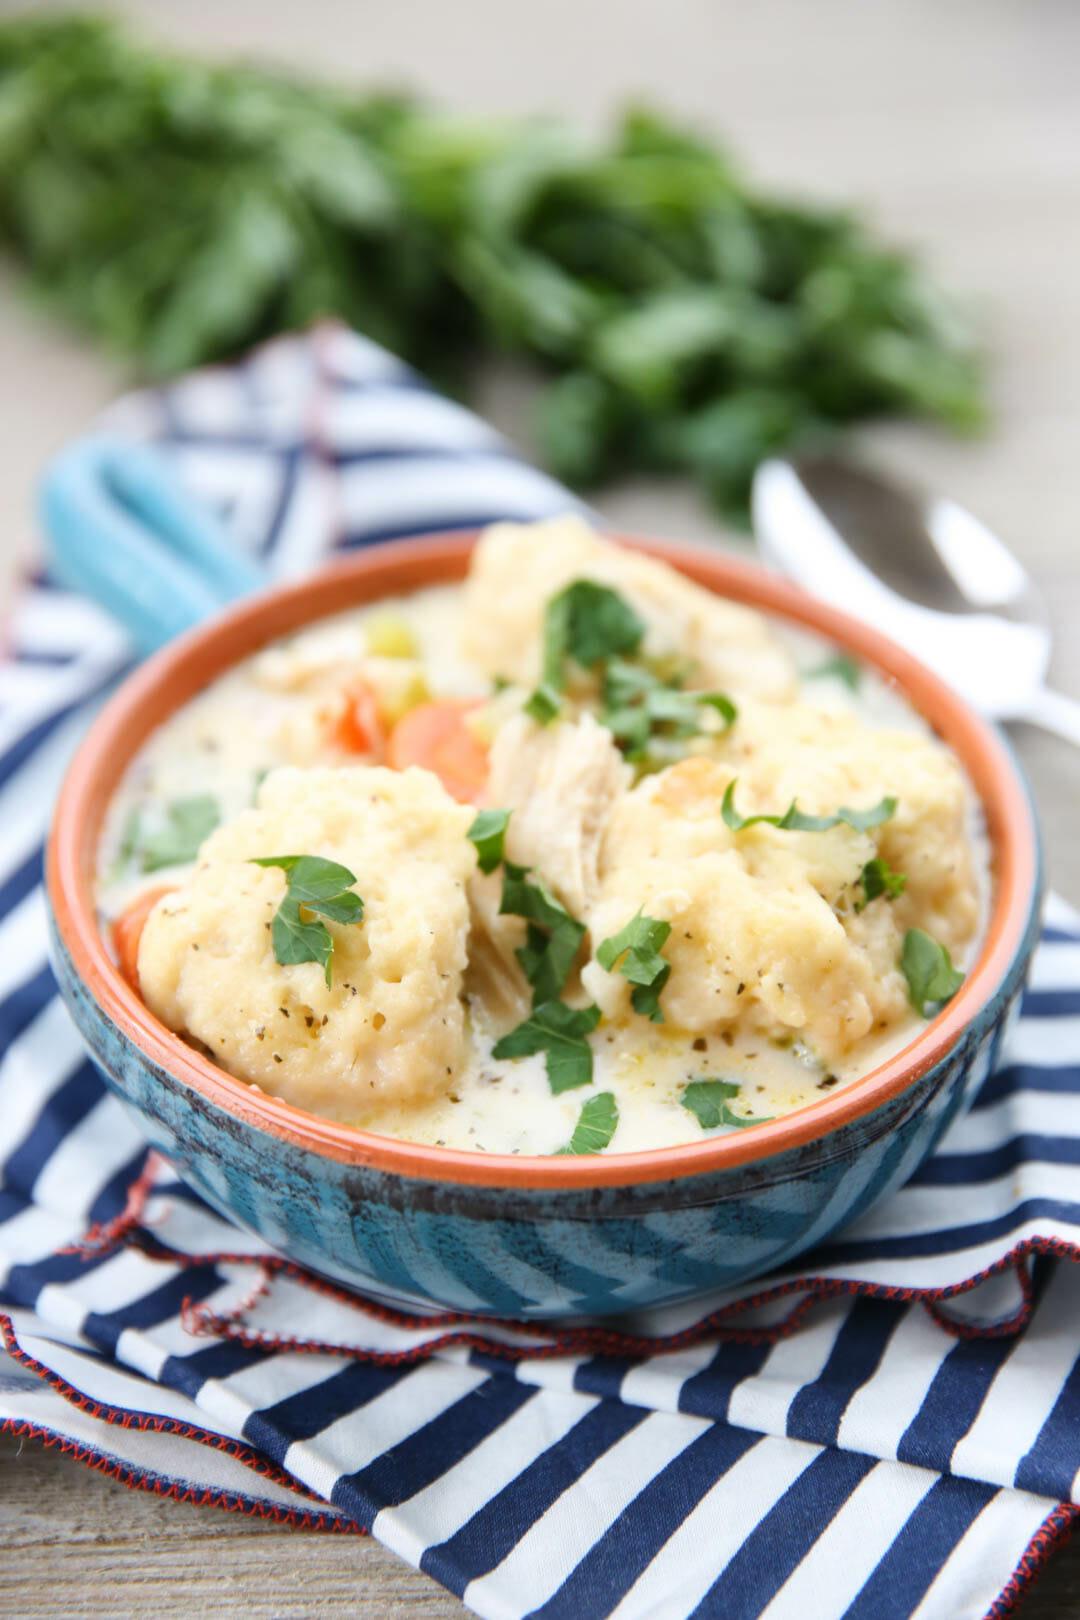 The Best Chicken and Dumpling Recipe